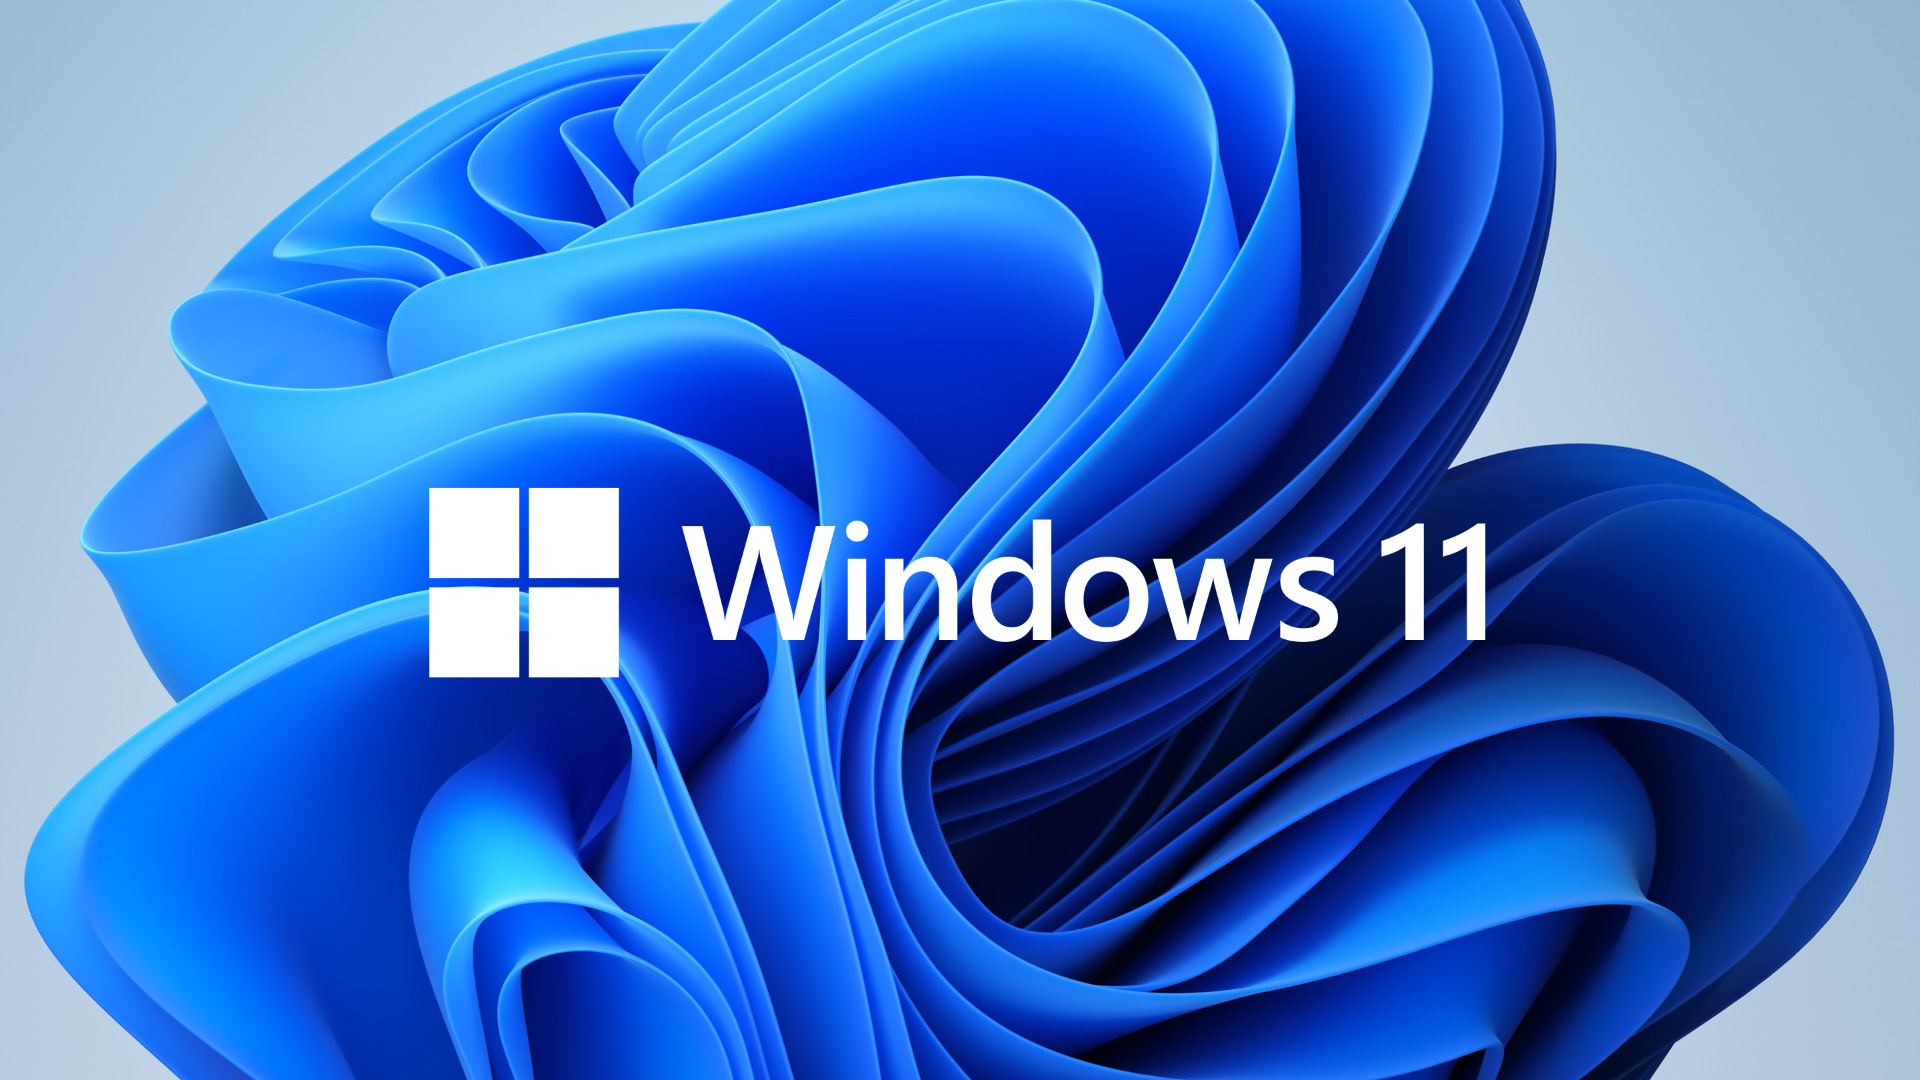 Logotipo do Windows 11 e fundo decorativo